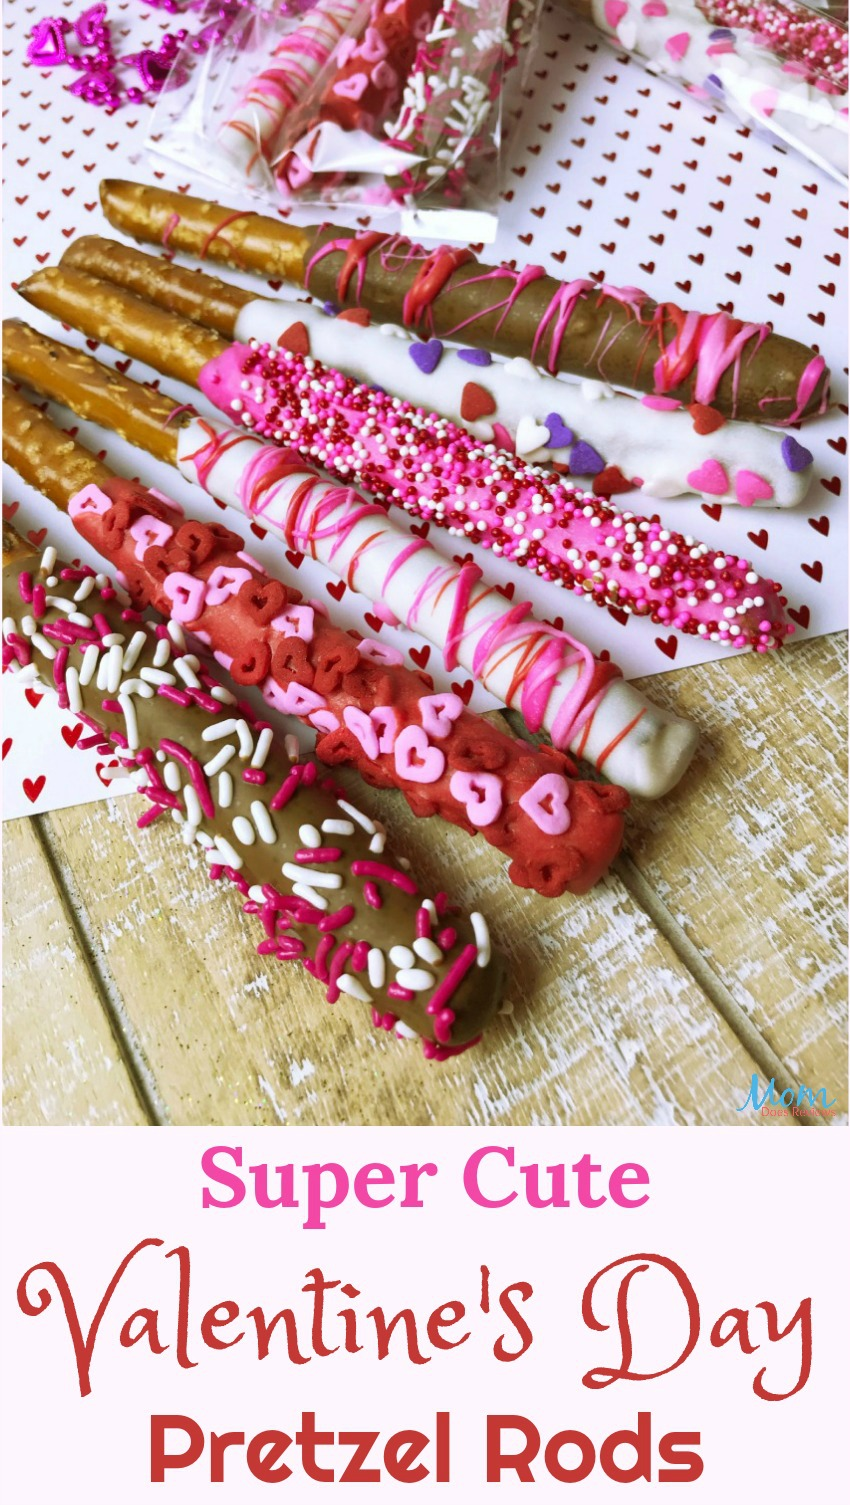 Super Cute Valentine's Day Pretzel Rods #Sweet2019 #sweets #treats #valentinesday #love #yummy #funfood